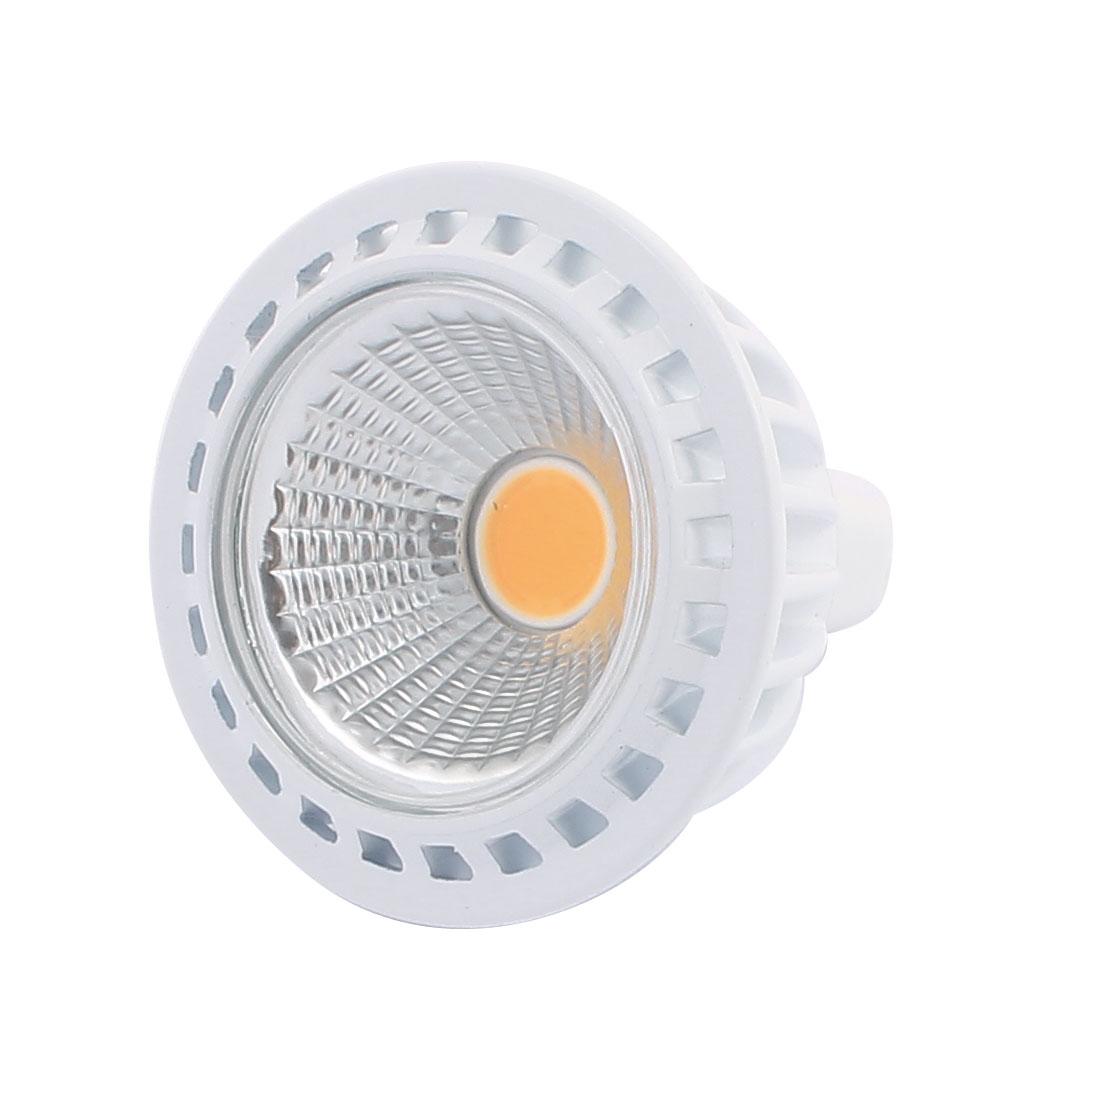 DC12V 3W Ultra Bright MR16 COB LED Spotlight Lamp Bulb Downlight Warm White